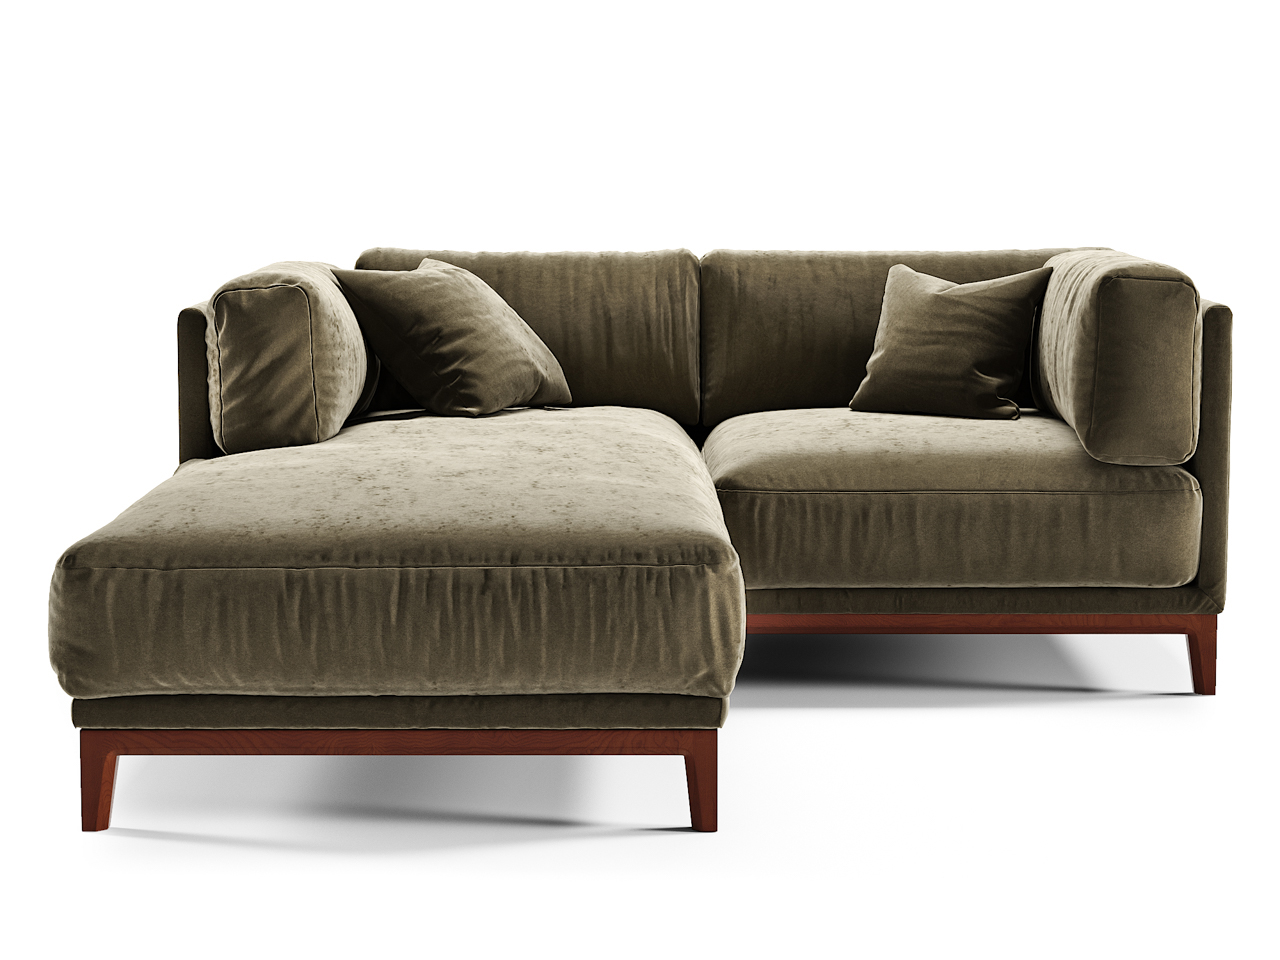 The idea диван case коричневый 108233/9